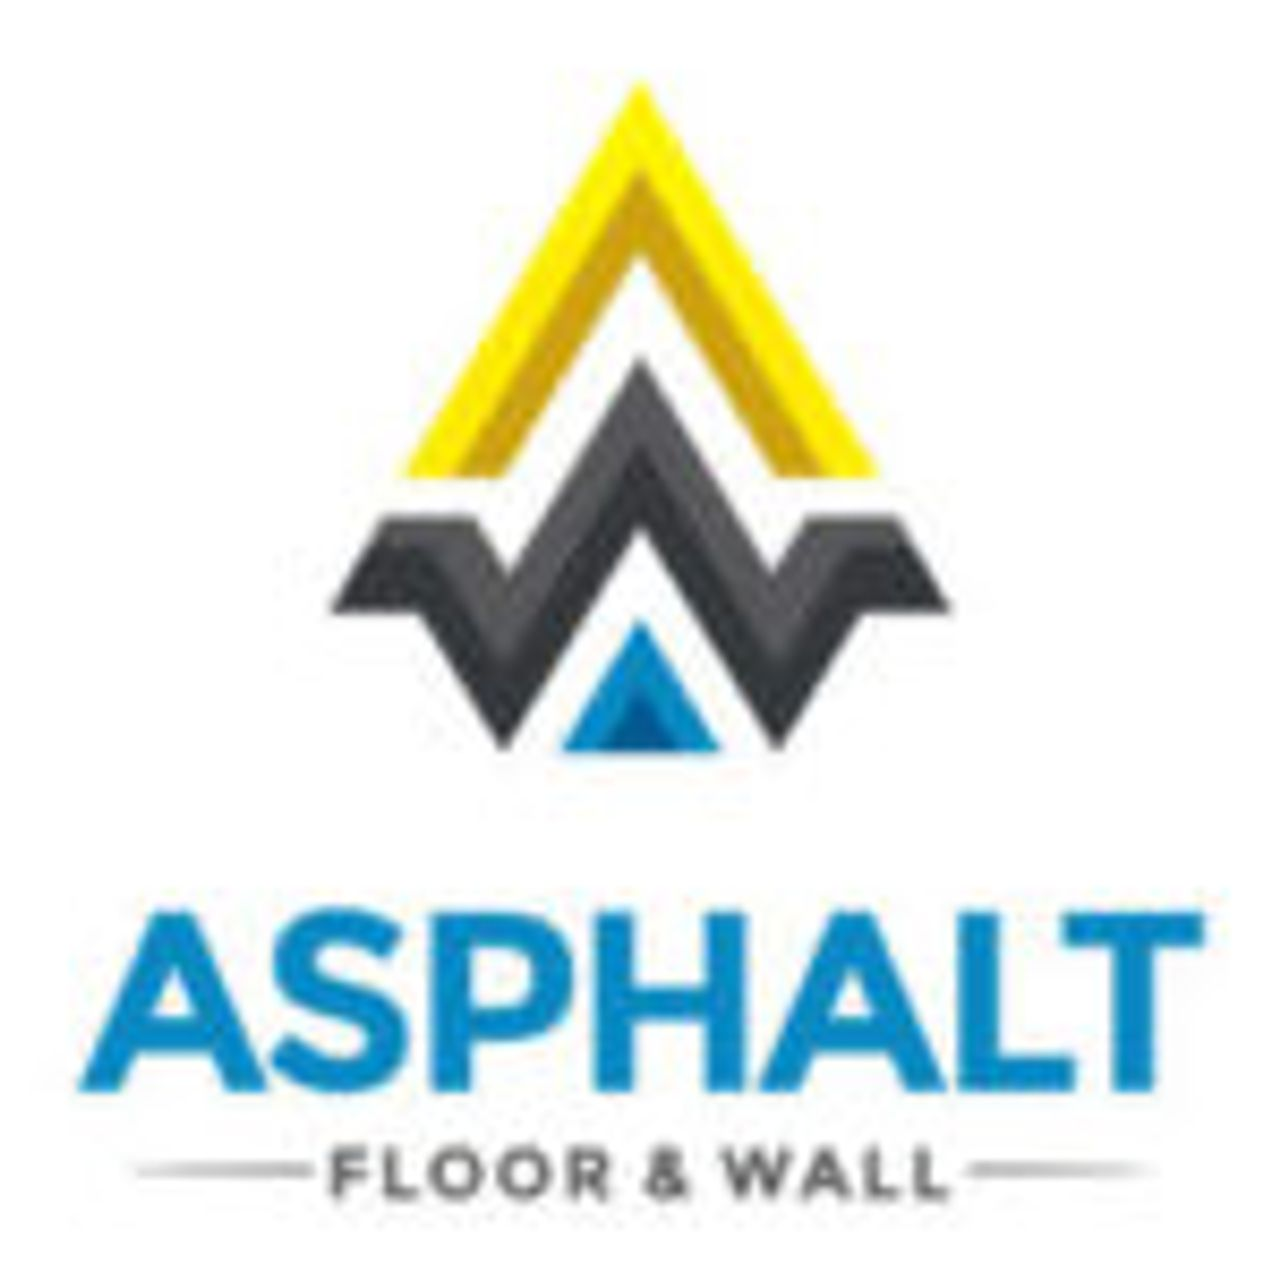 Image Asphalt Art - Floor Graphics